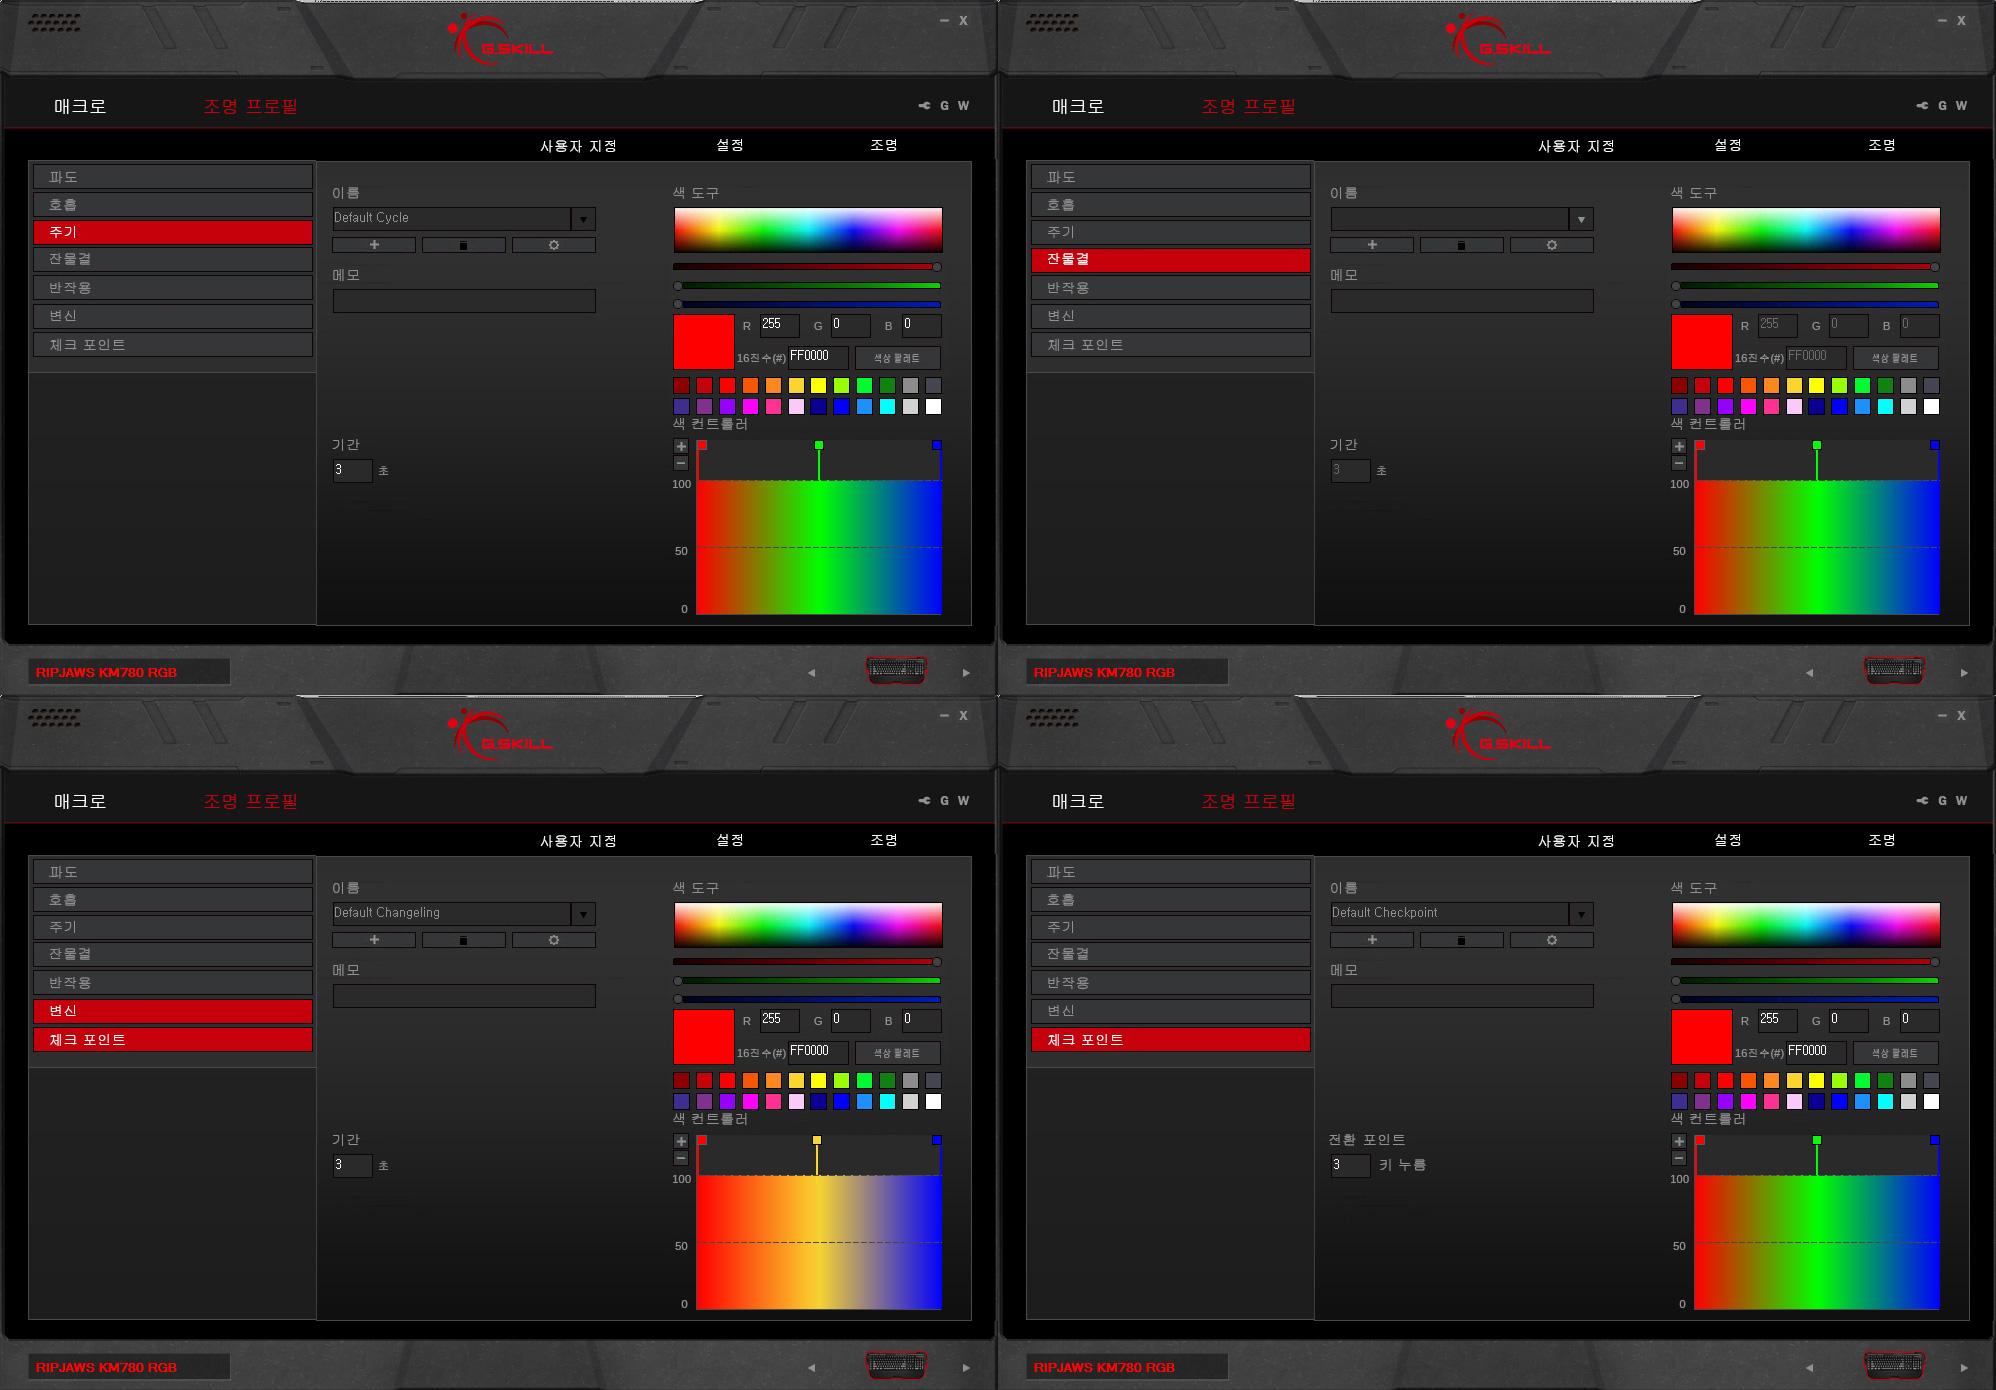 ����ų ���ҽ� ���̹� Ű���� KM780 Ŀ���� G.SKILL RIPJAWSKeyboard KM780_RGB -119.jpg